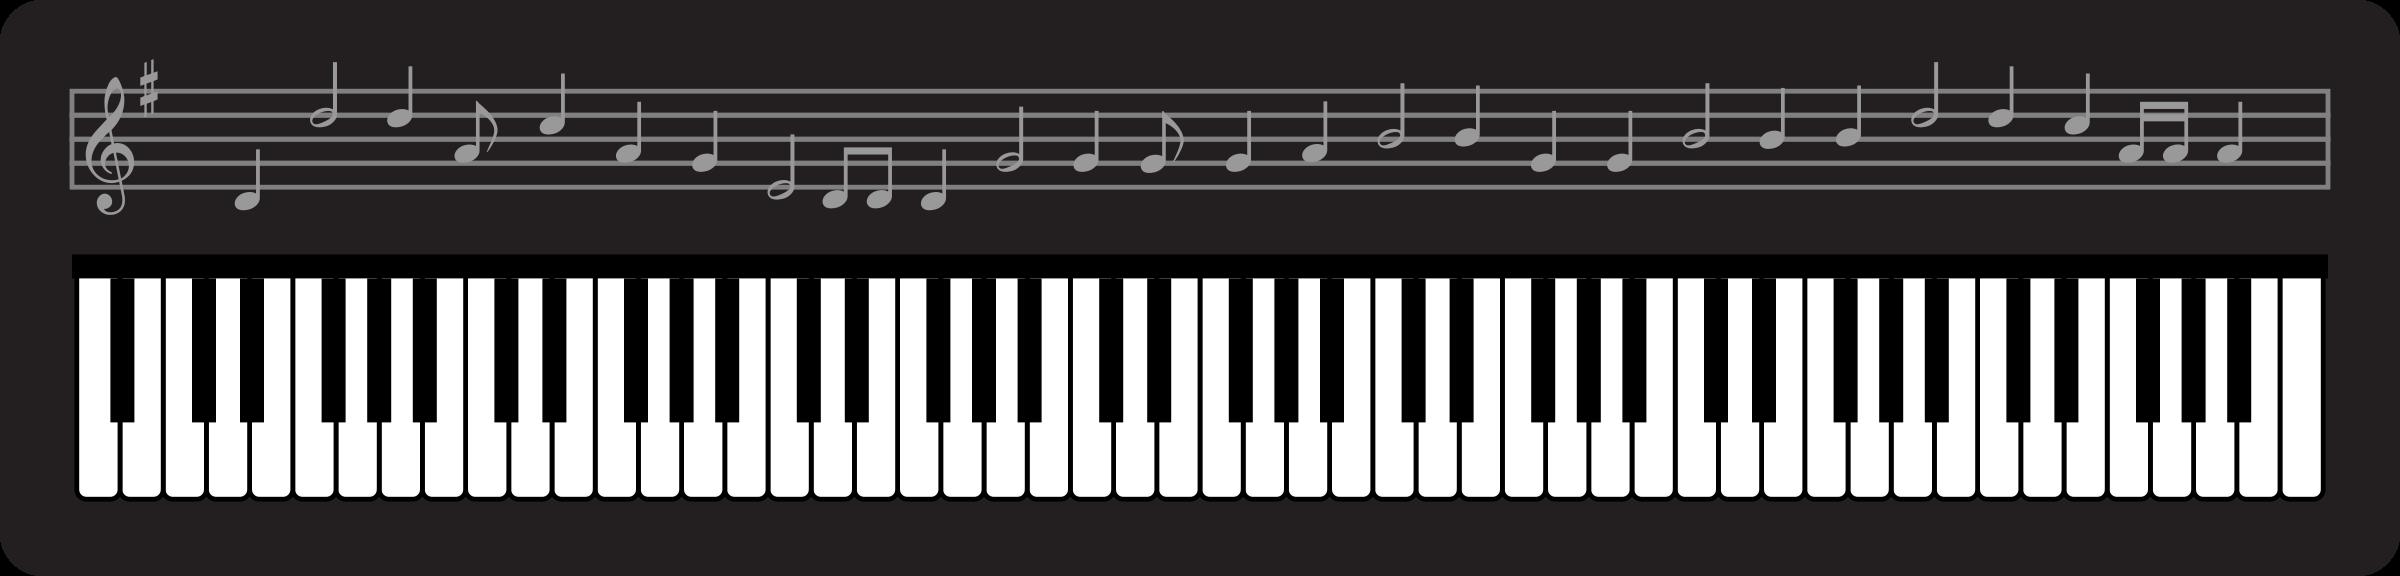 Organs clipart keyboard instrument Keyboard Clipart Keyboard